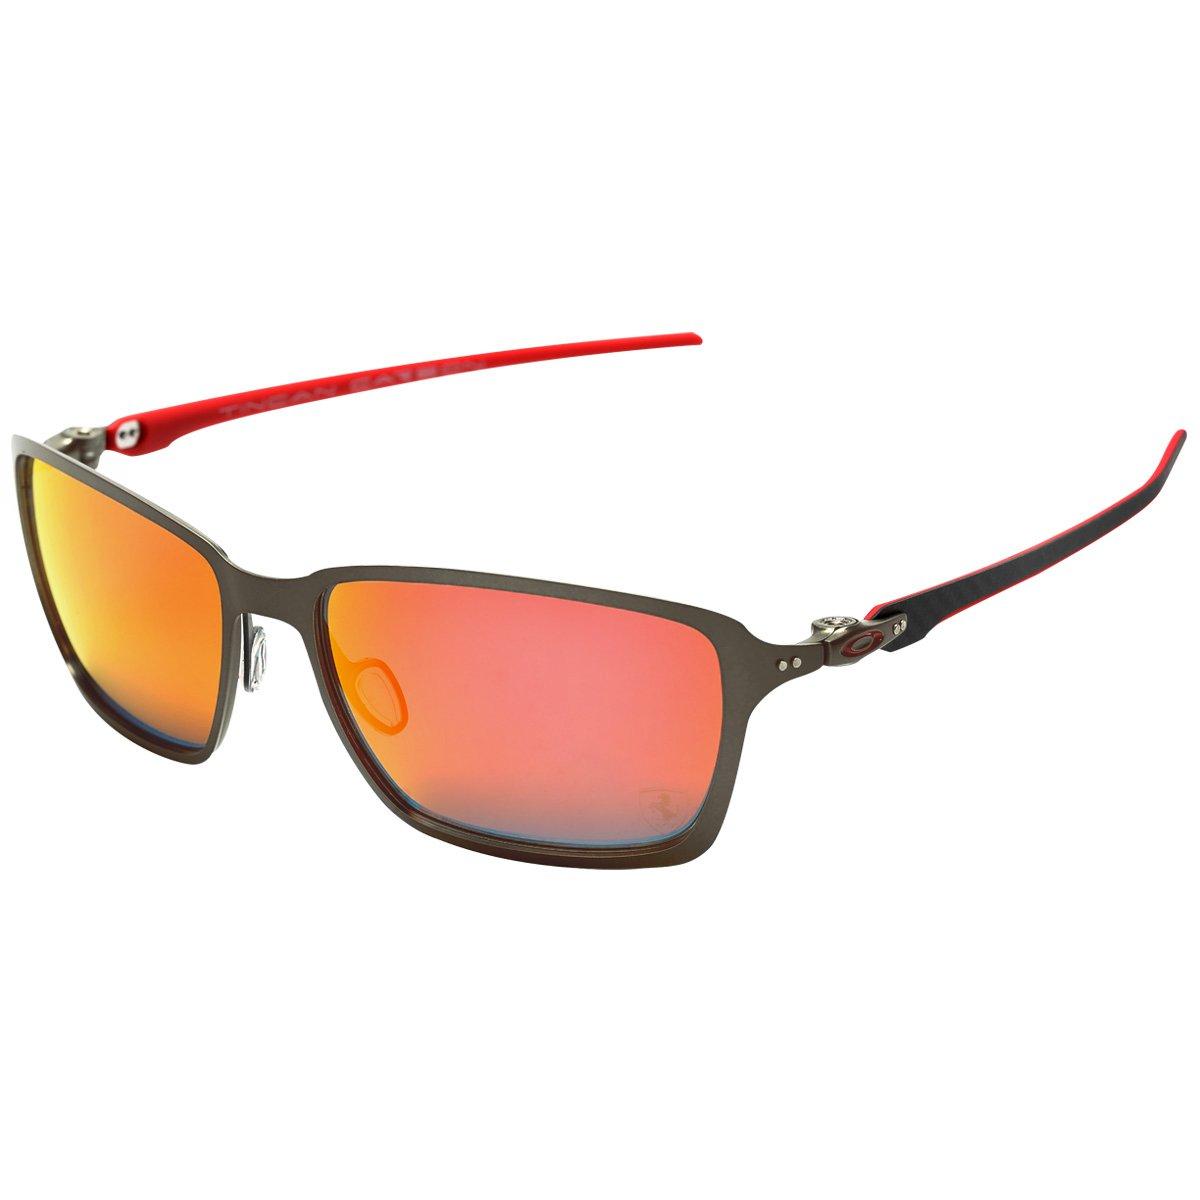 Óculos Oakley Ferrari Tincan Carbon - Iridium - Compre Agora   Netshoes 90187cfba7